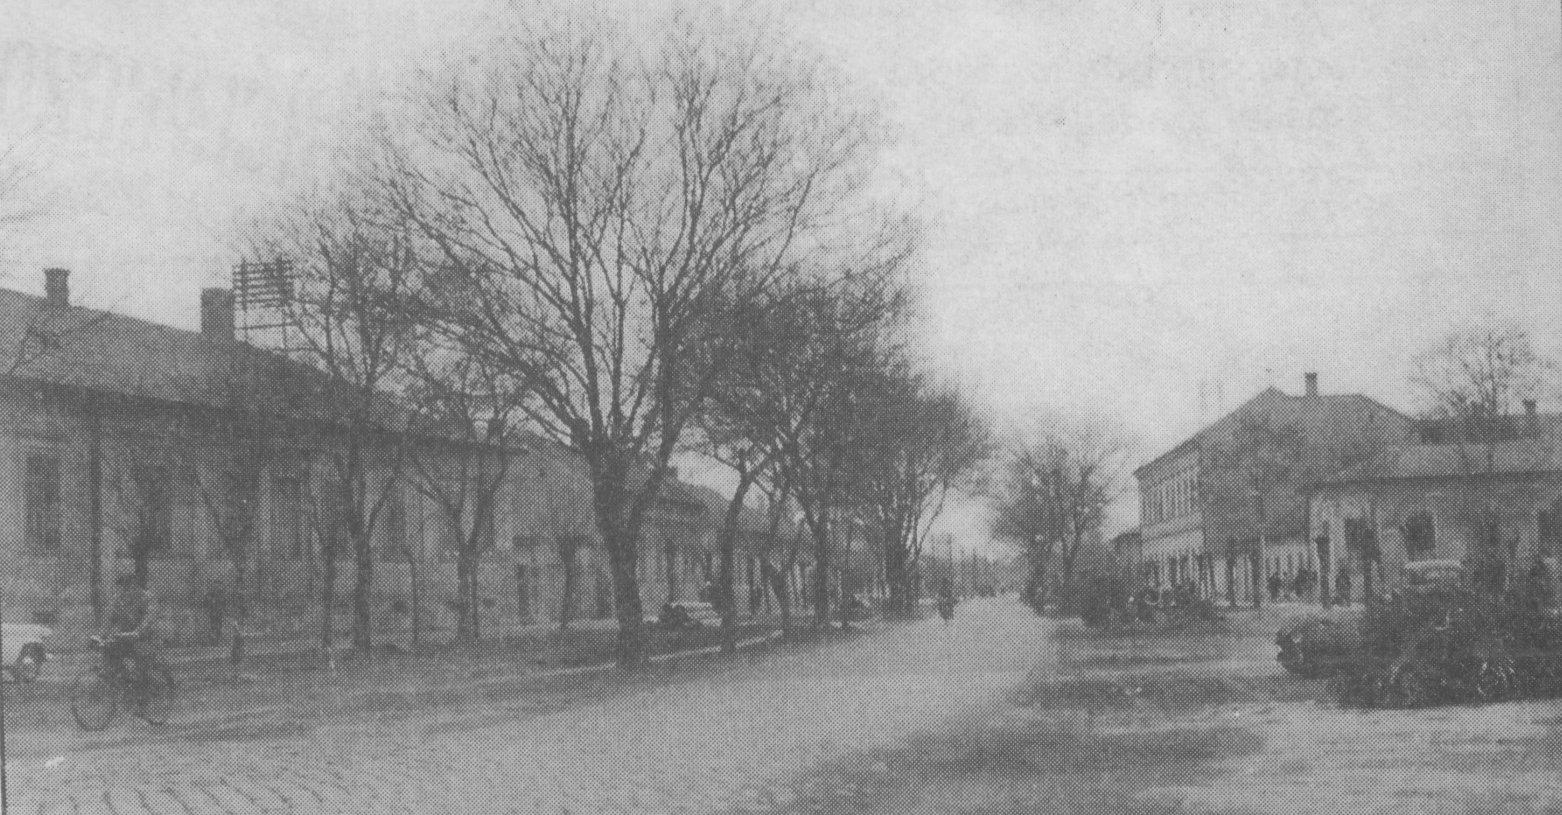 baross_utca_1960_korul.jpg